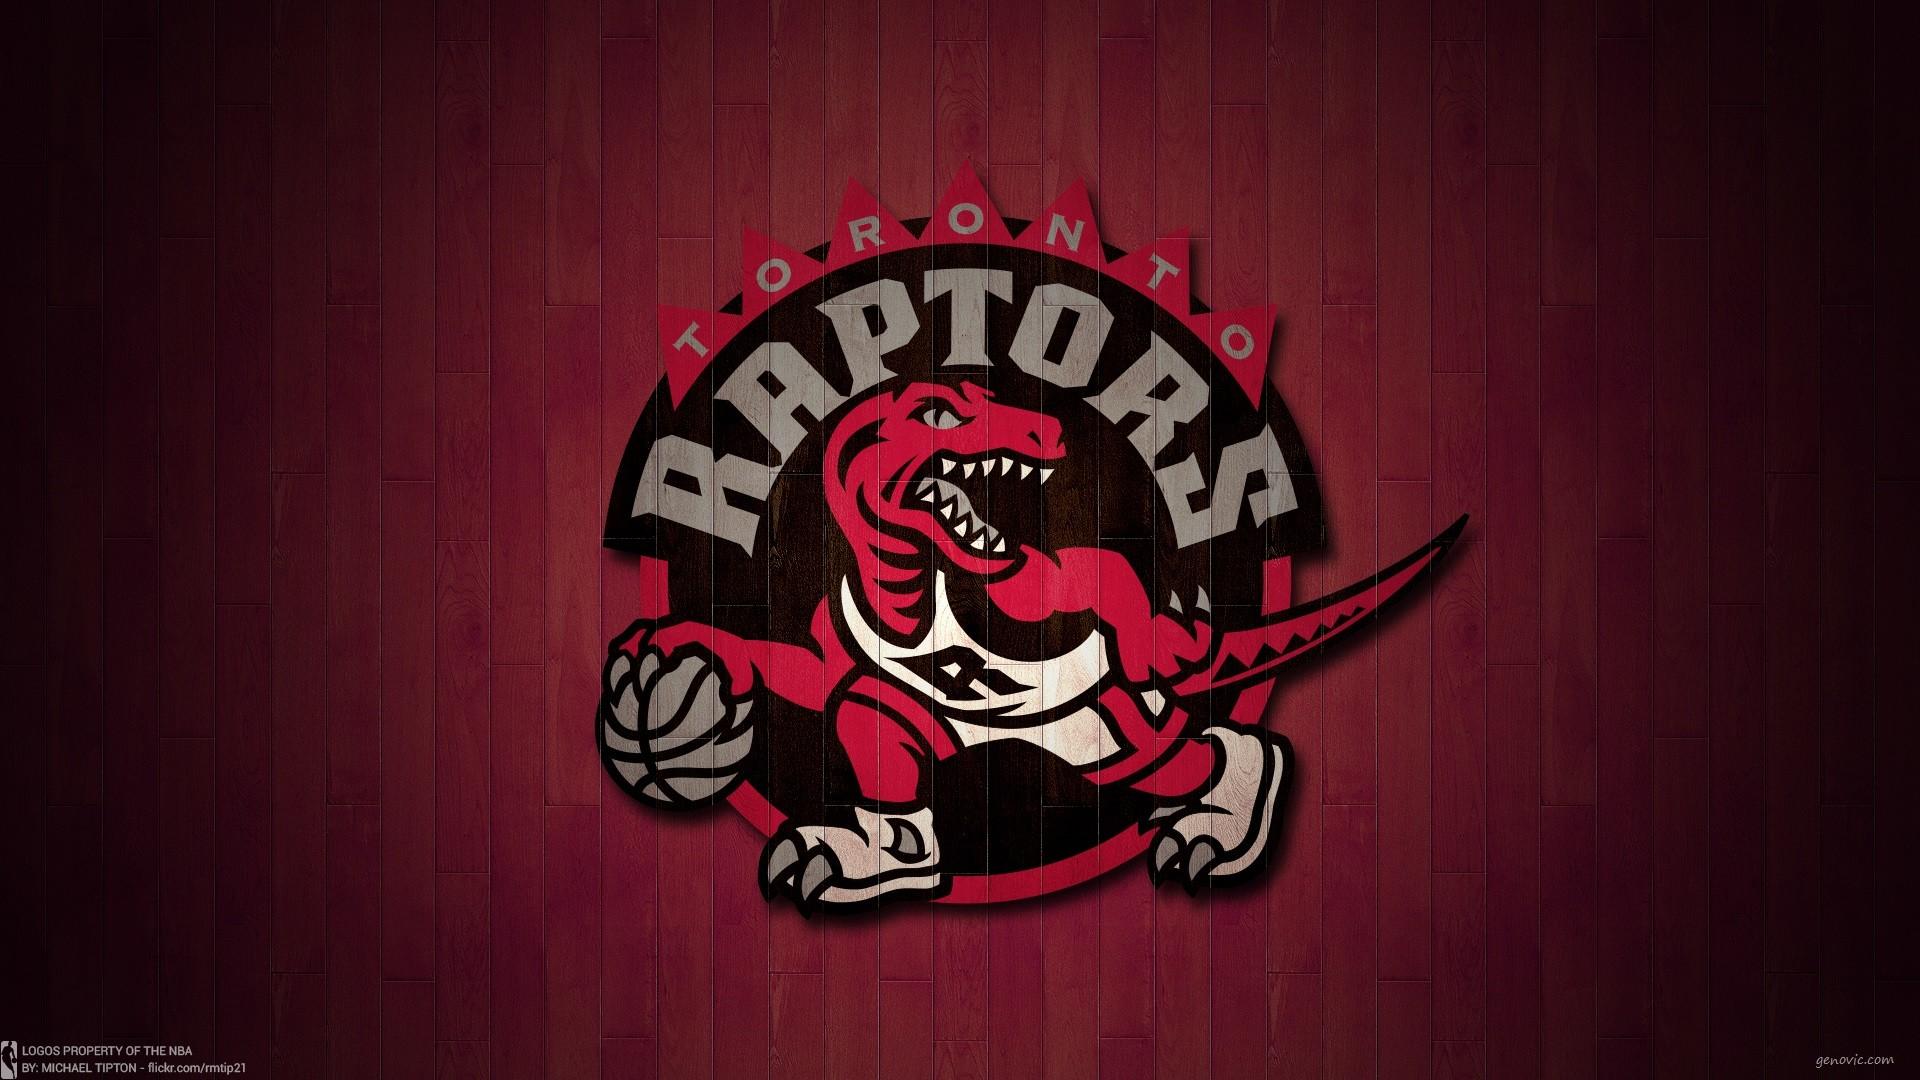 Toronto Raptors: Toronto Raptors Wallpaper HD (78+ Images